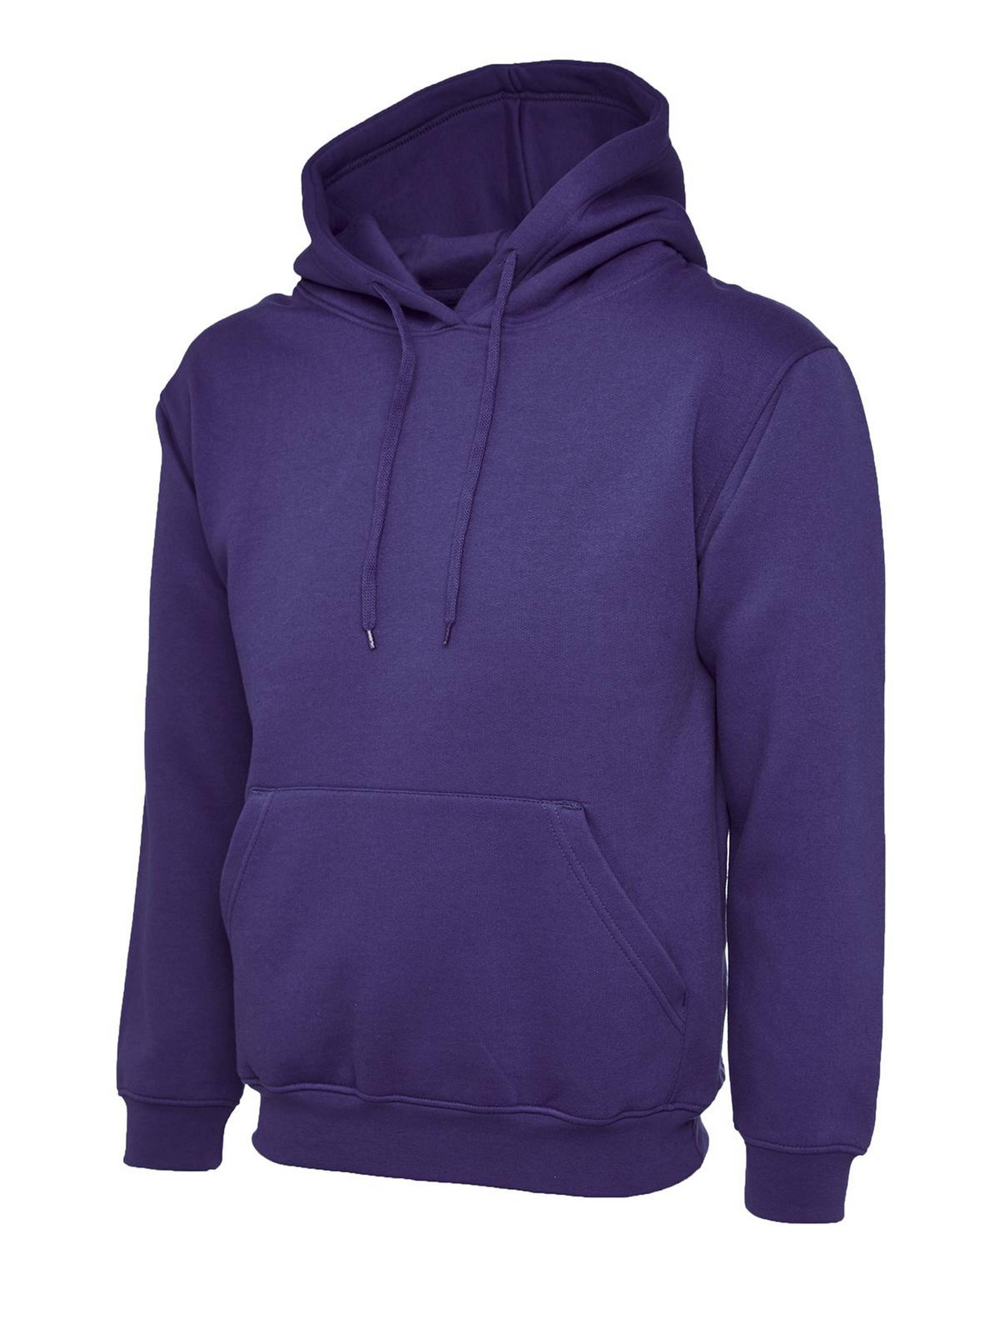 Uneek Olympic Hooded Sweatshirt